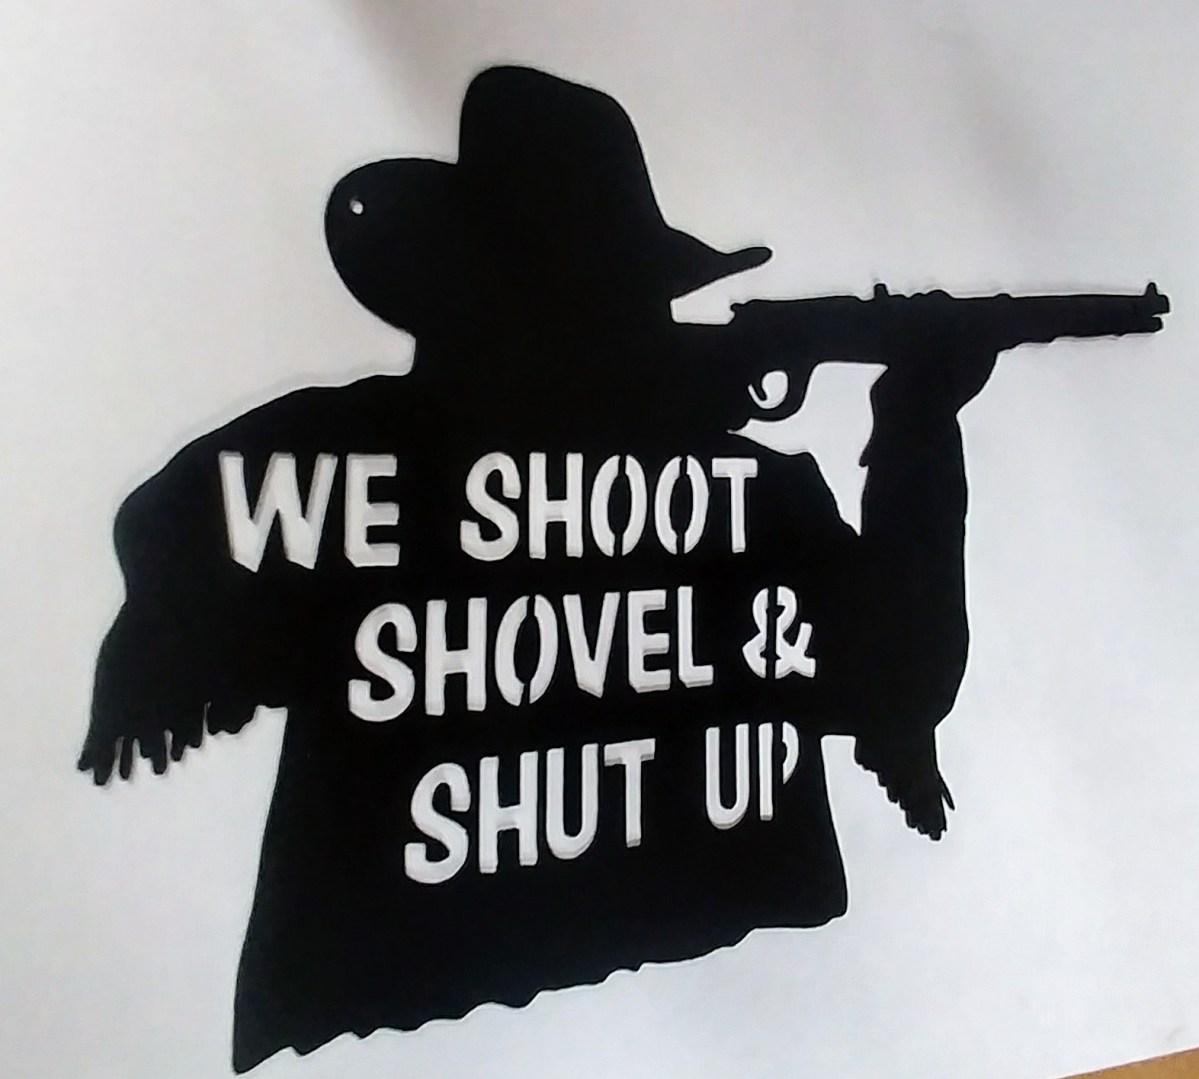 We Shoot Shovel And Shut Up Funny Western Metal Art